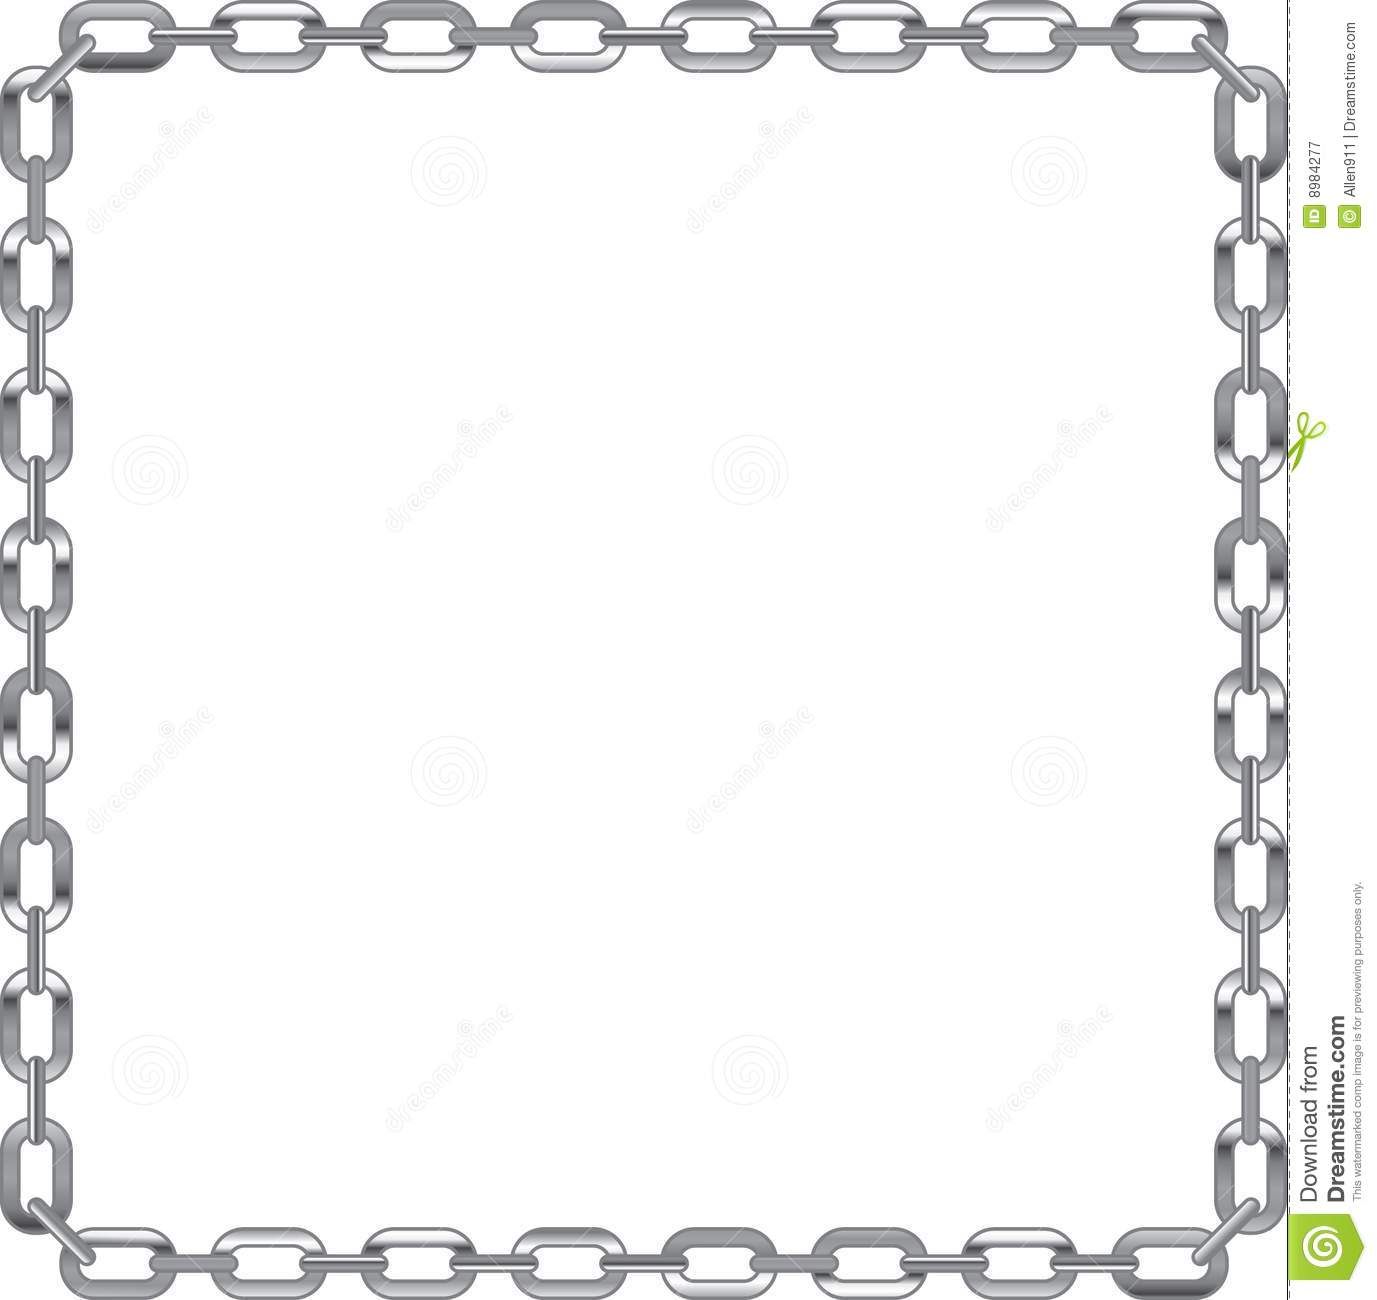 Link . Chain clipart border